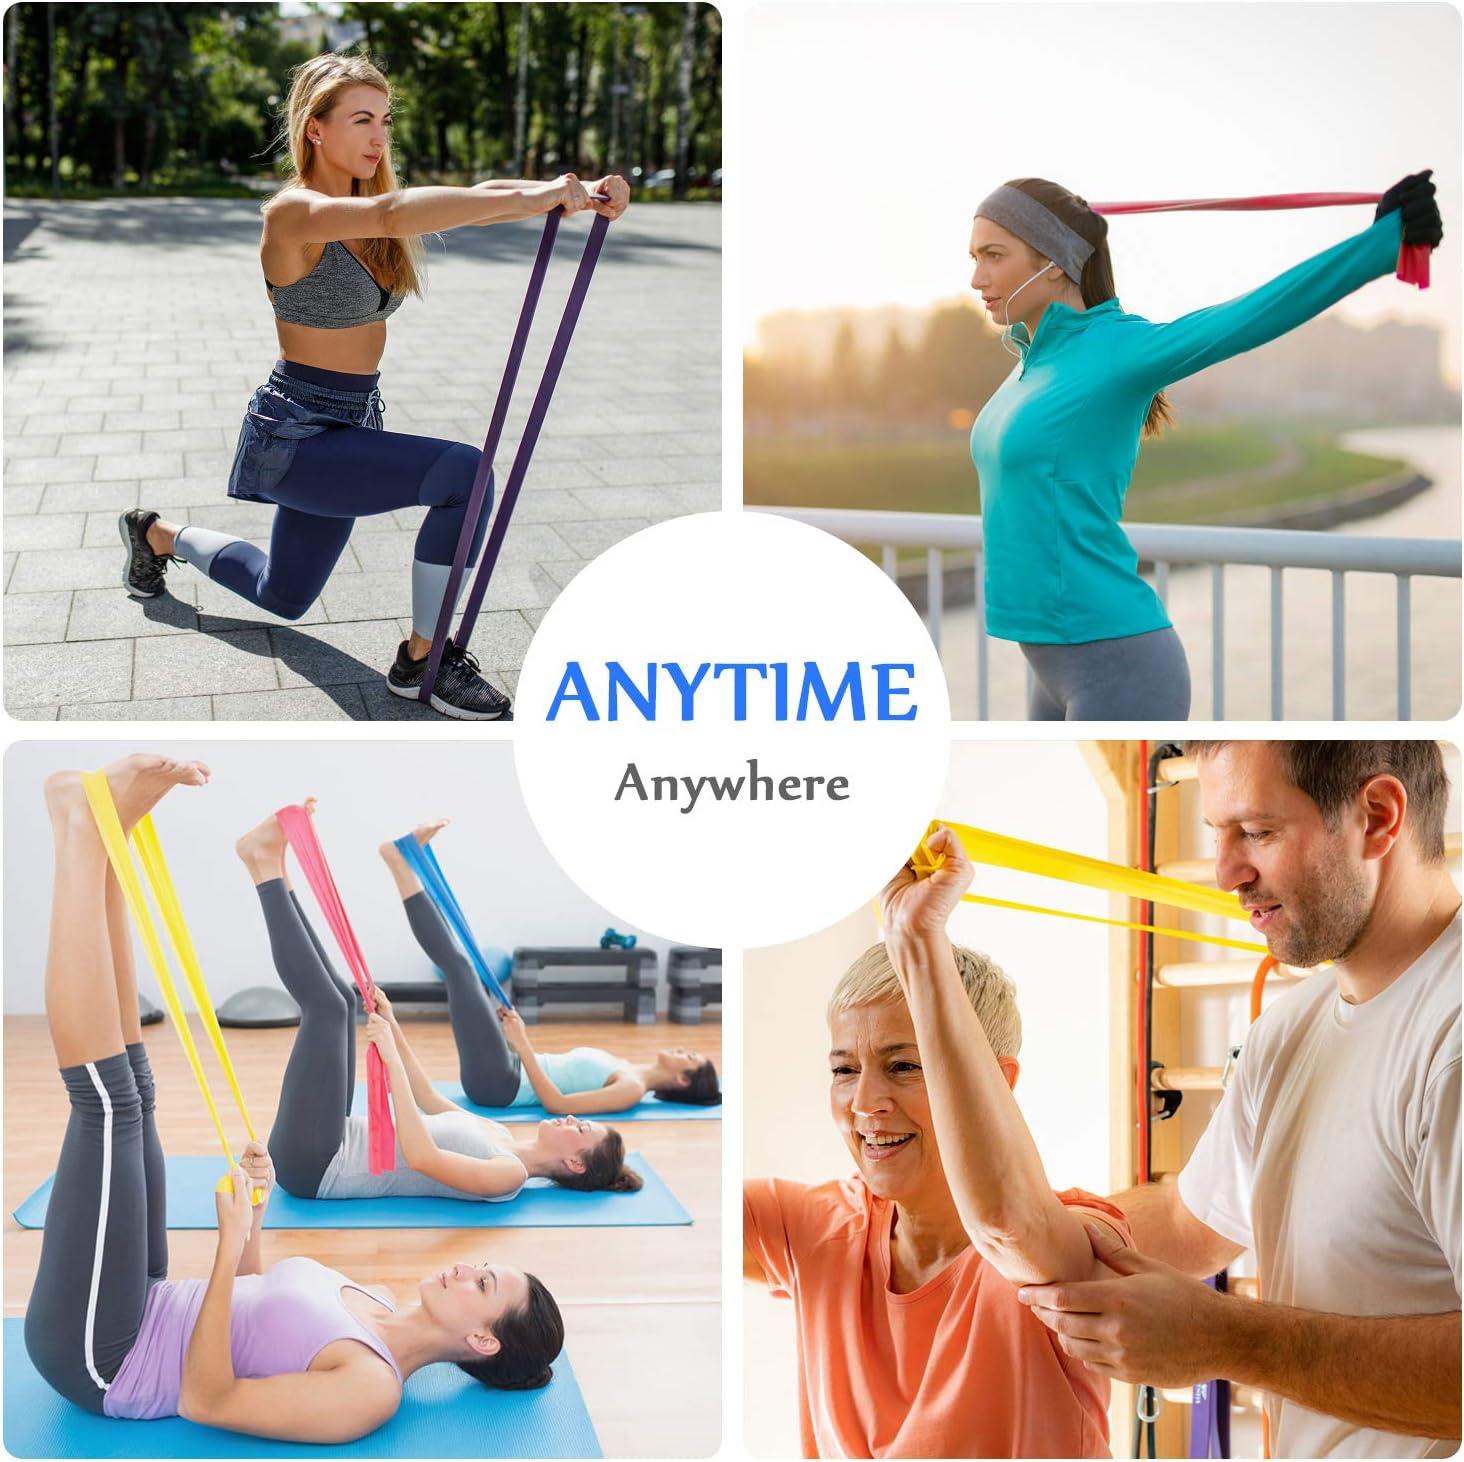 Crossfit WayEee Widerstandsb/änder Fitnessb/änder 4er Set Gymnastikb/änder aus Naturlatex Gummiband Fitness Theraband f/ür Muskelaufbau Pilates Gymnastik Yoga